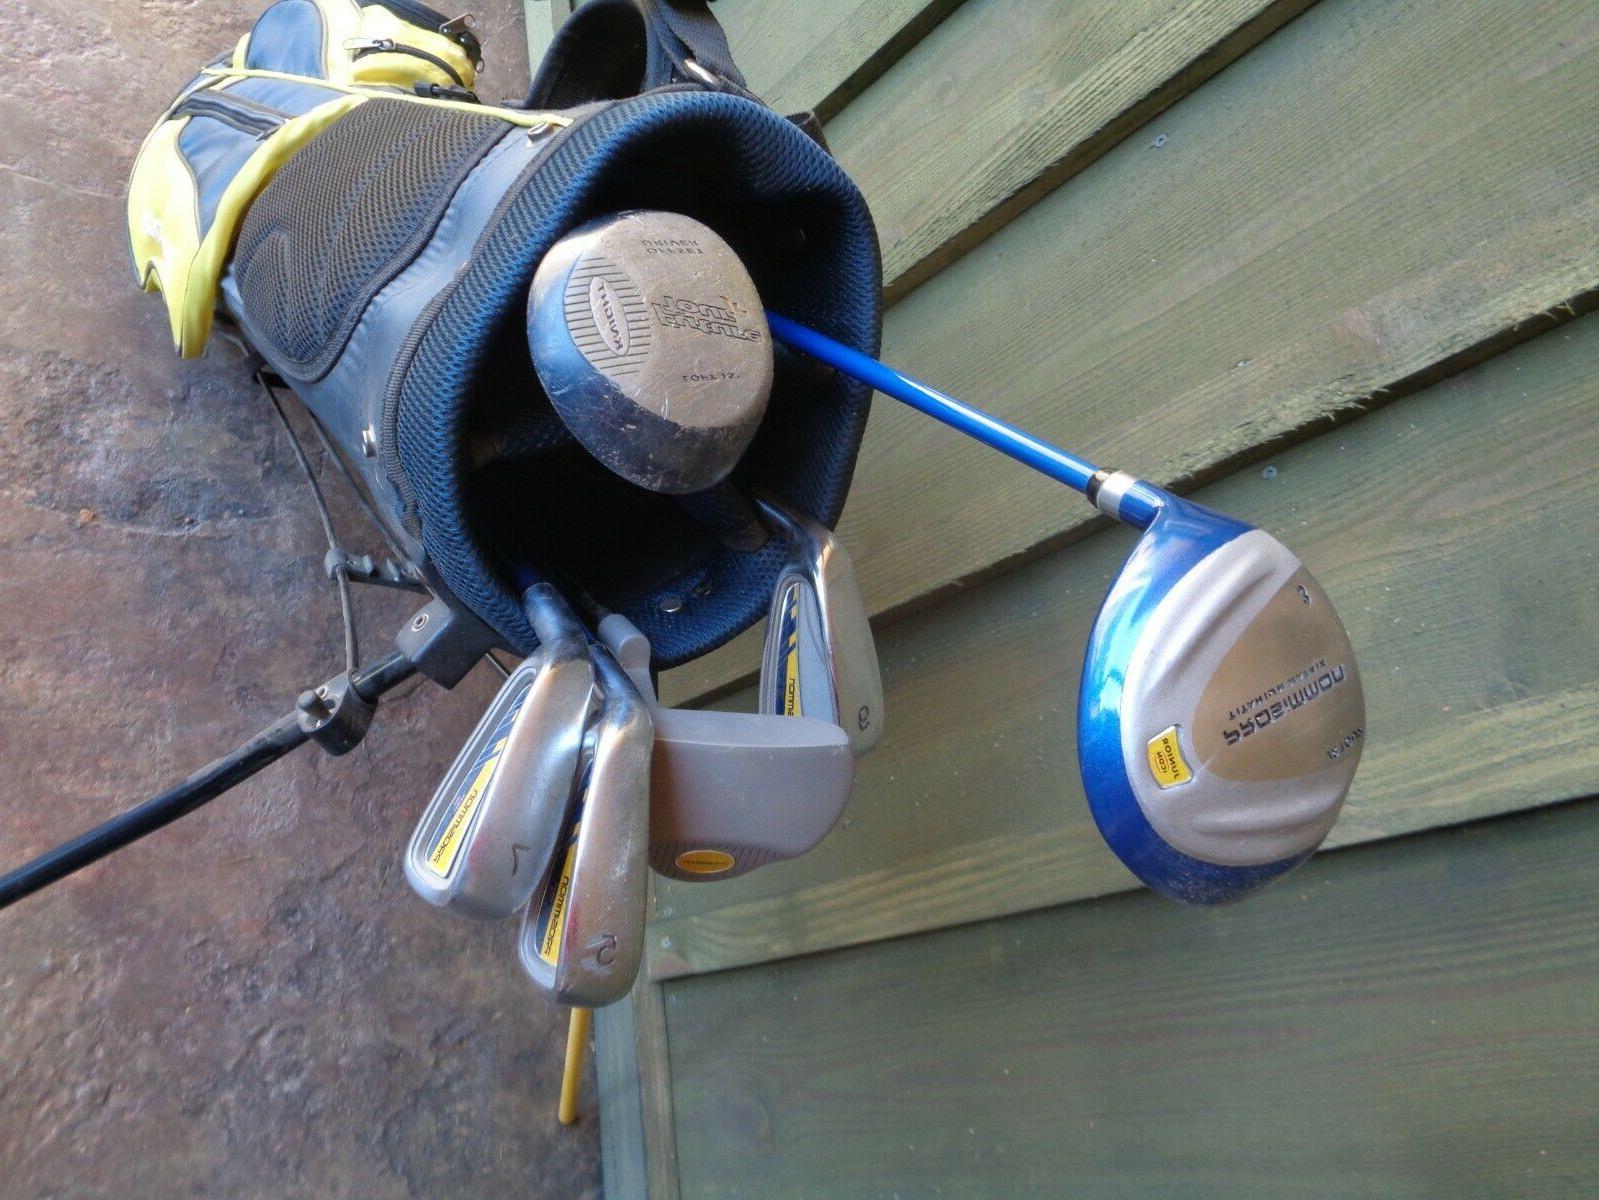 Kids Prosimmon Junior Golf Clubs Bag - 11 Yrs Right Children's Maxfli